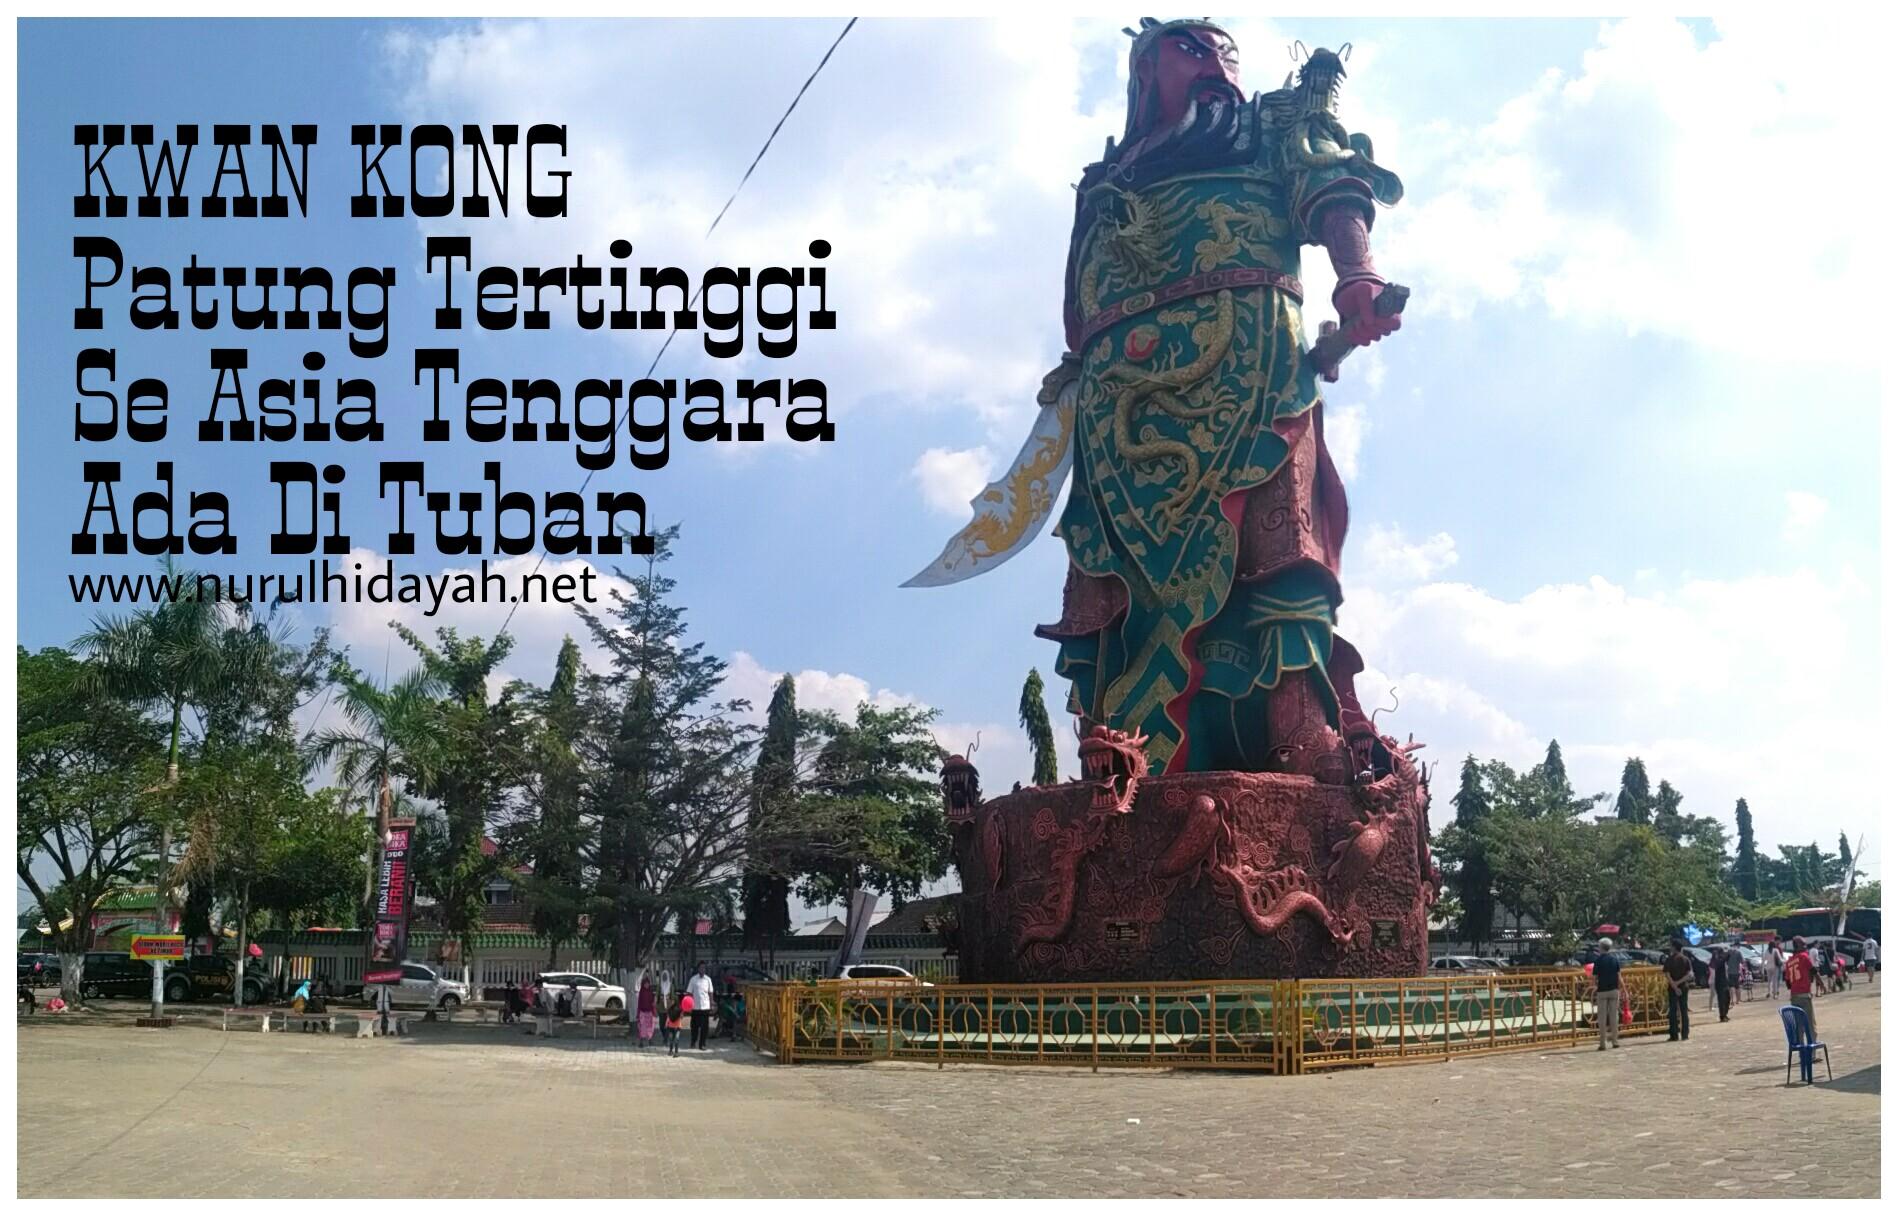 Patung Tertinggi Se Asia Tenggara Ada Di Tuban Indonesia